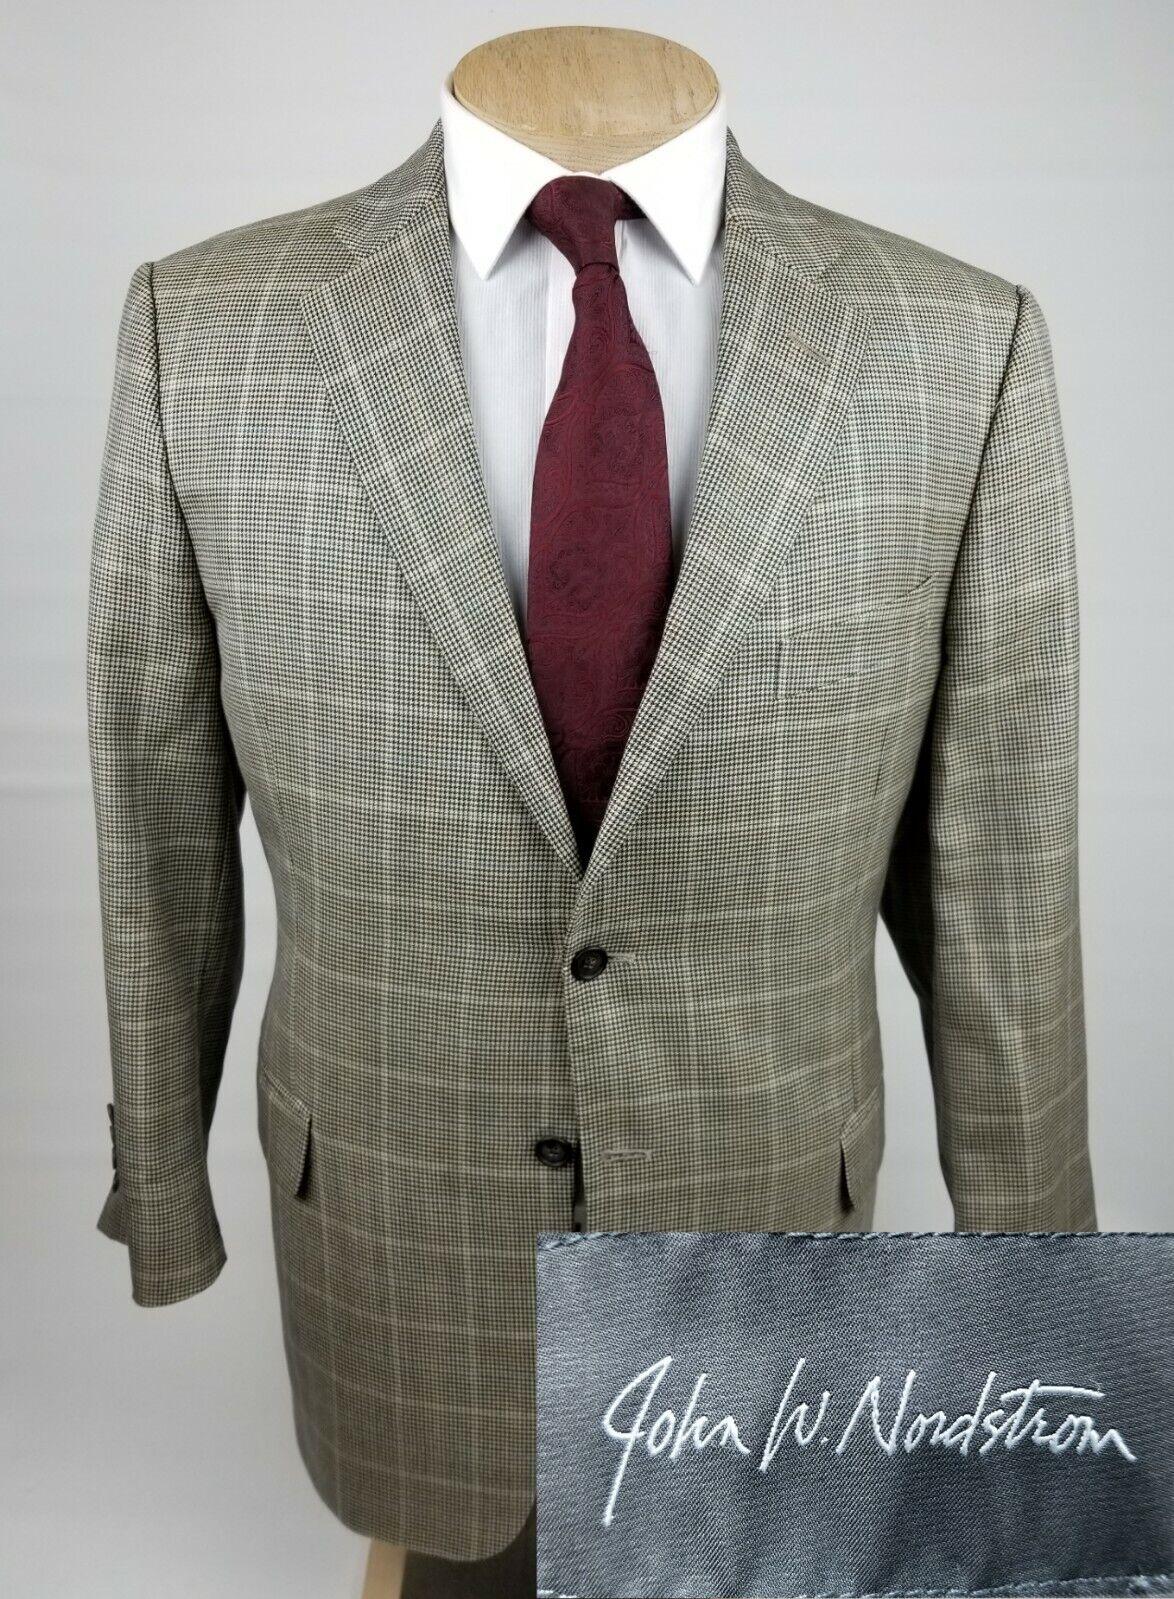 JOHN W NORDSTROM Men's Sport Coat 44R Wool   Silk Blazer Brown Plaid Houndstooth